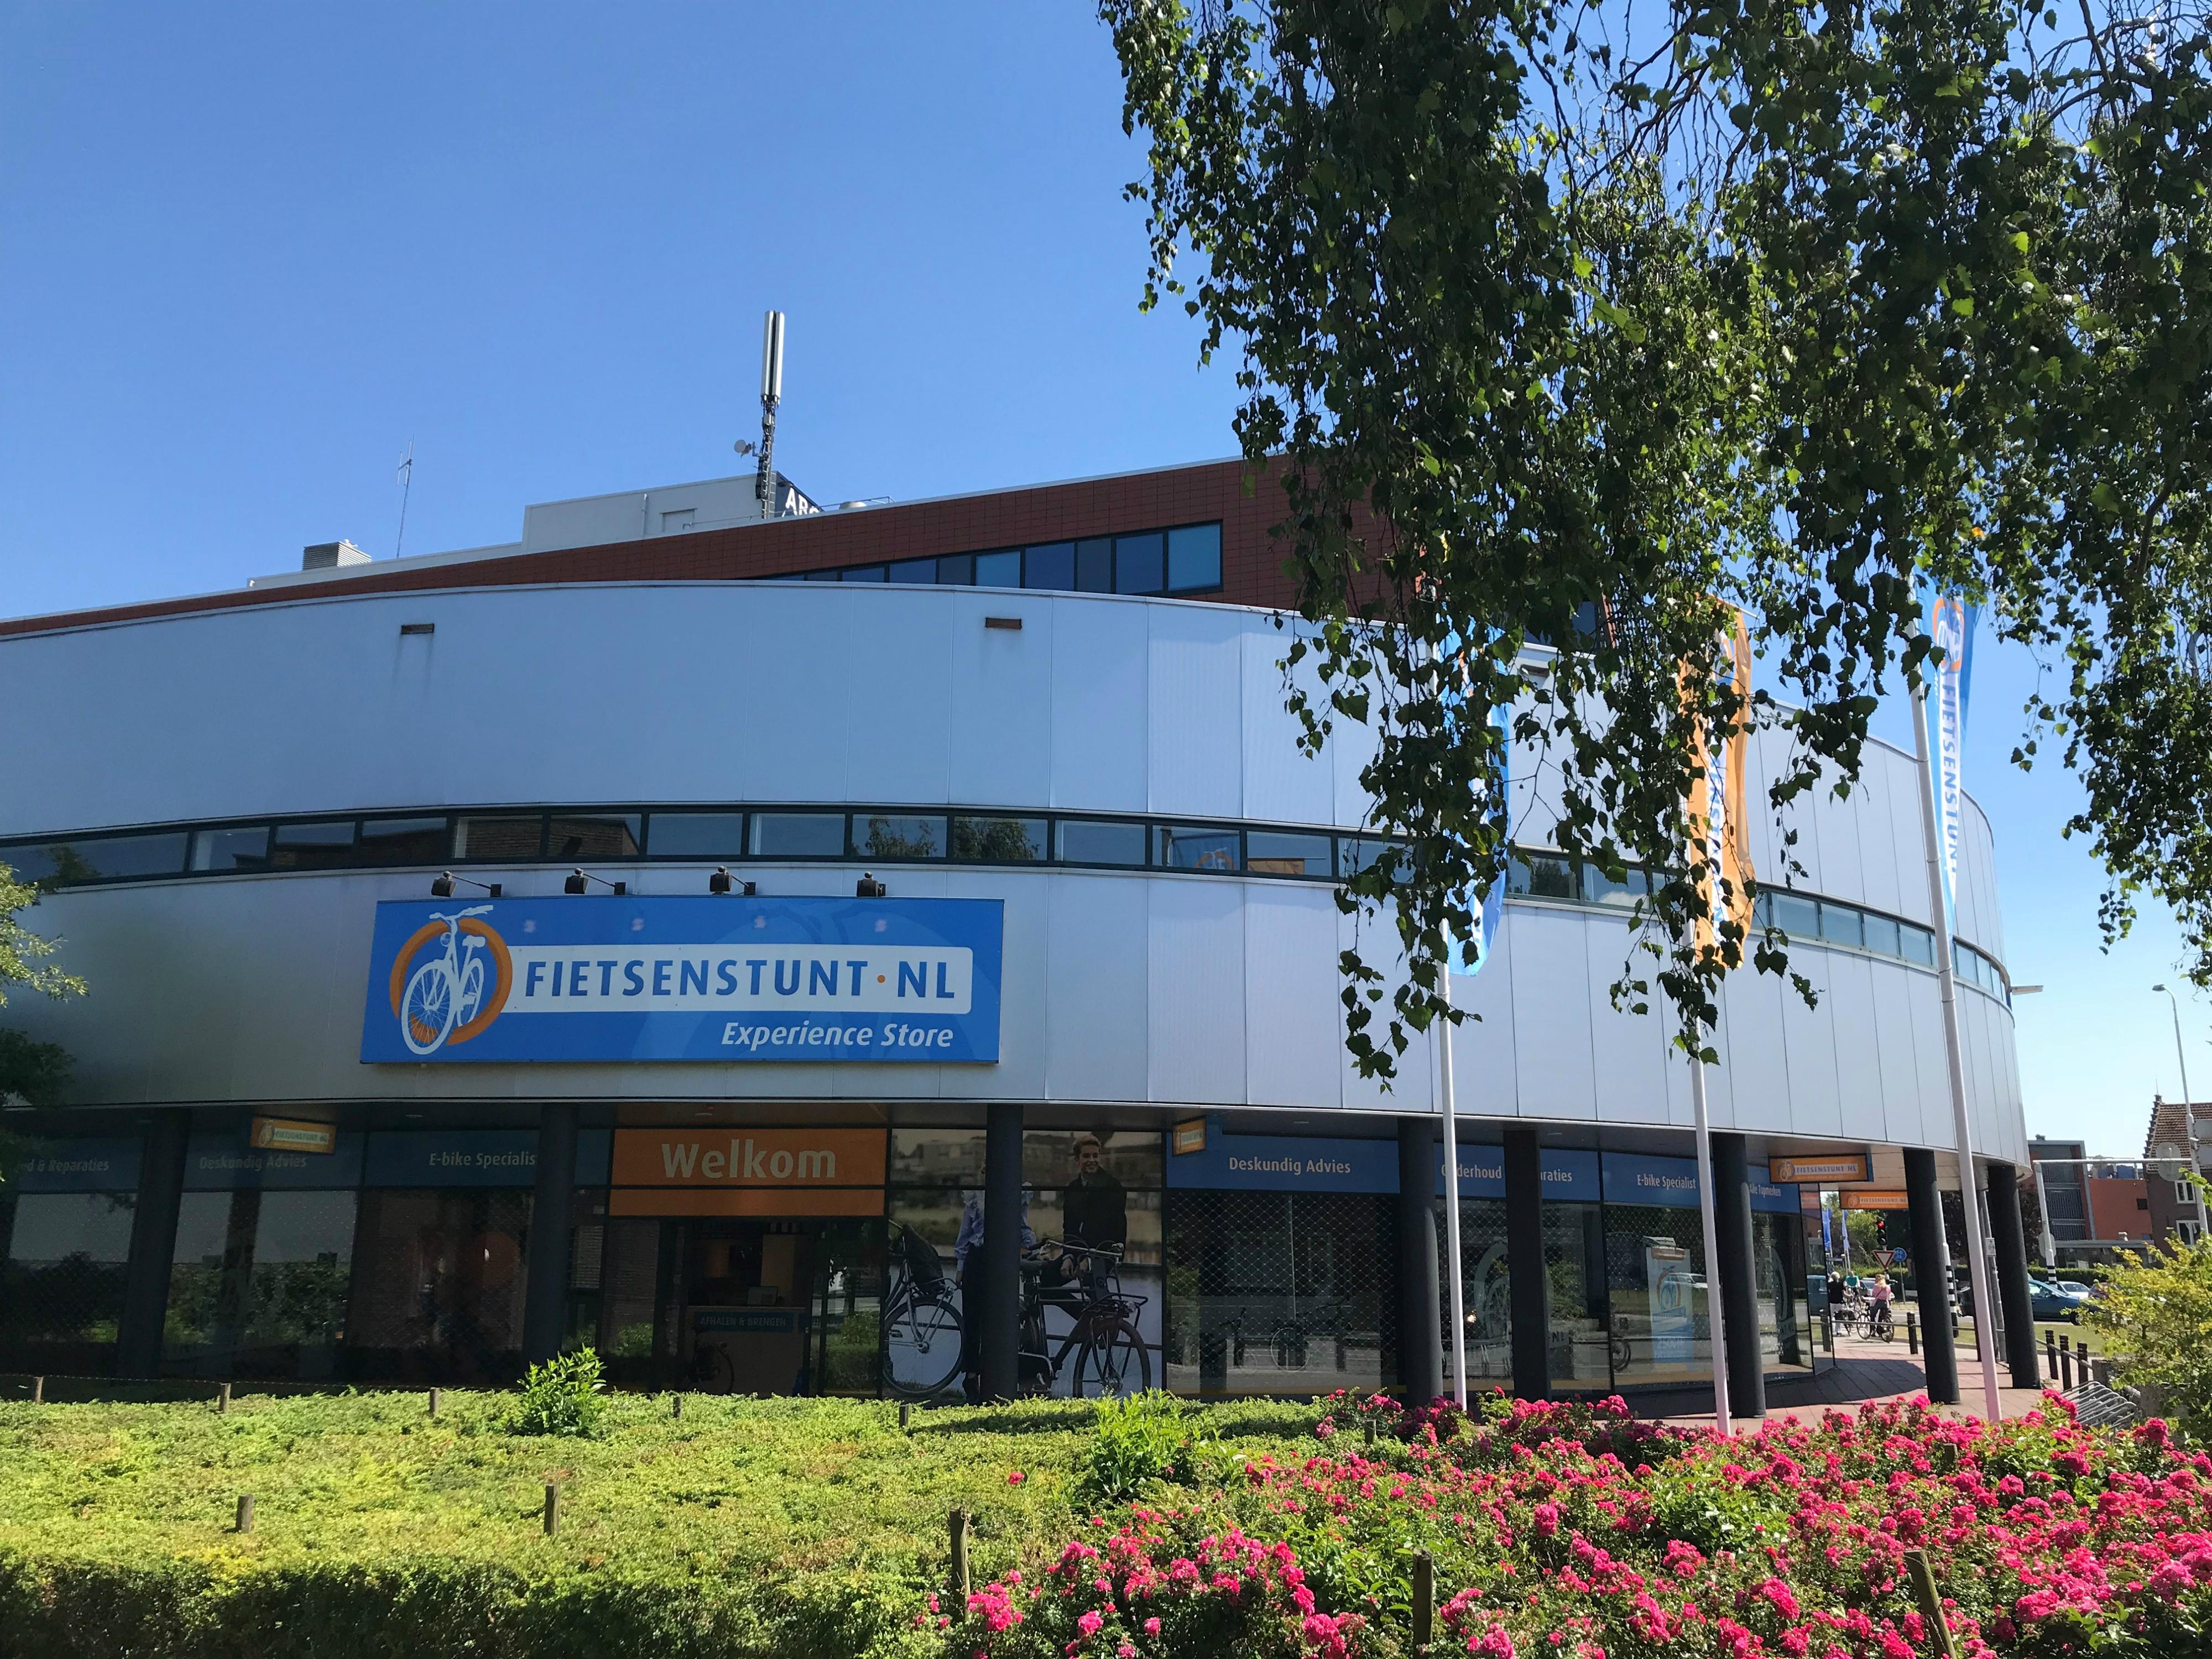 Foto Hoorn testcentrum